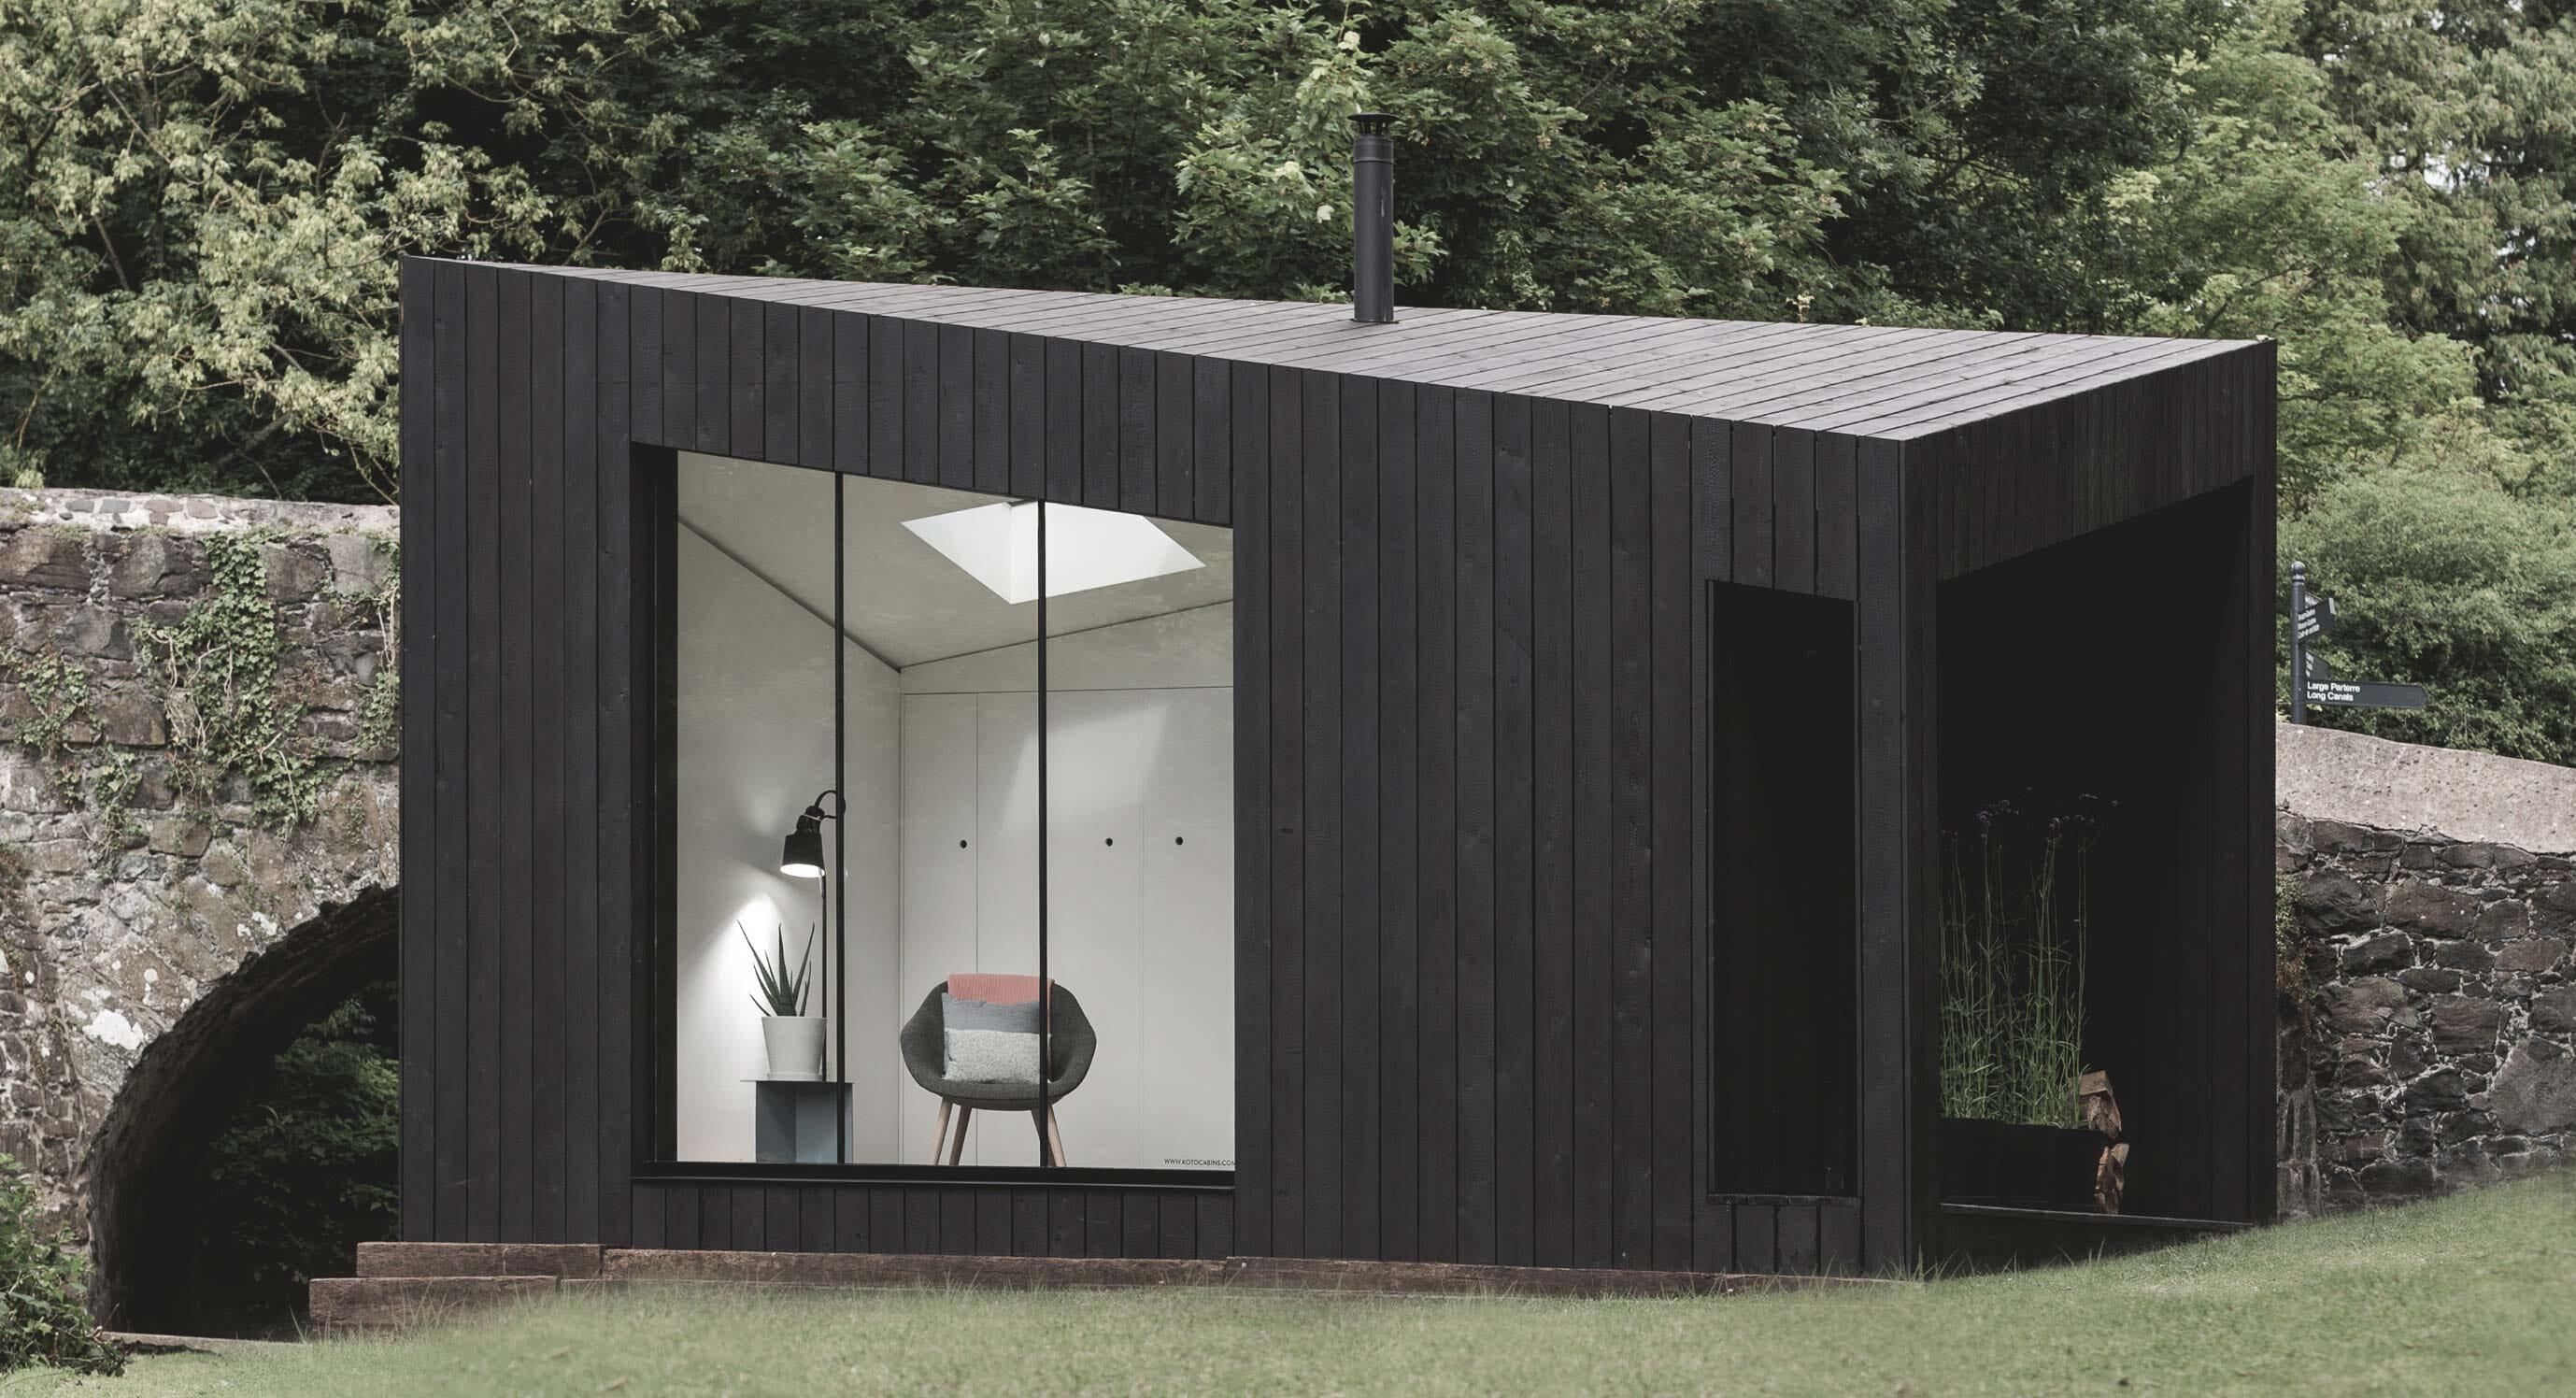 Koto's Flexible Cabins Offer A Proper Taste Of Nordic Living